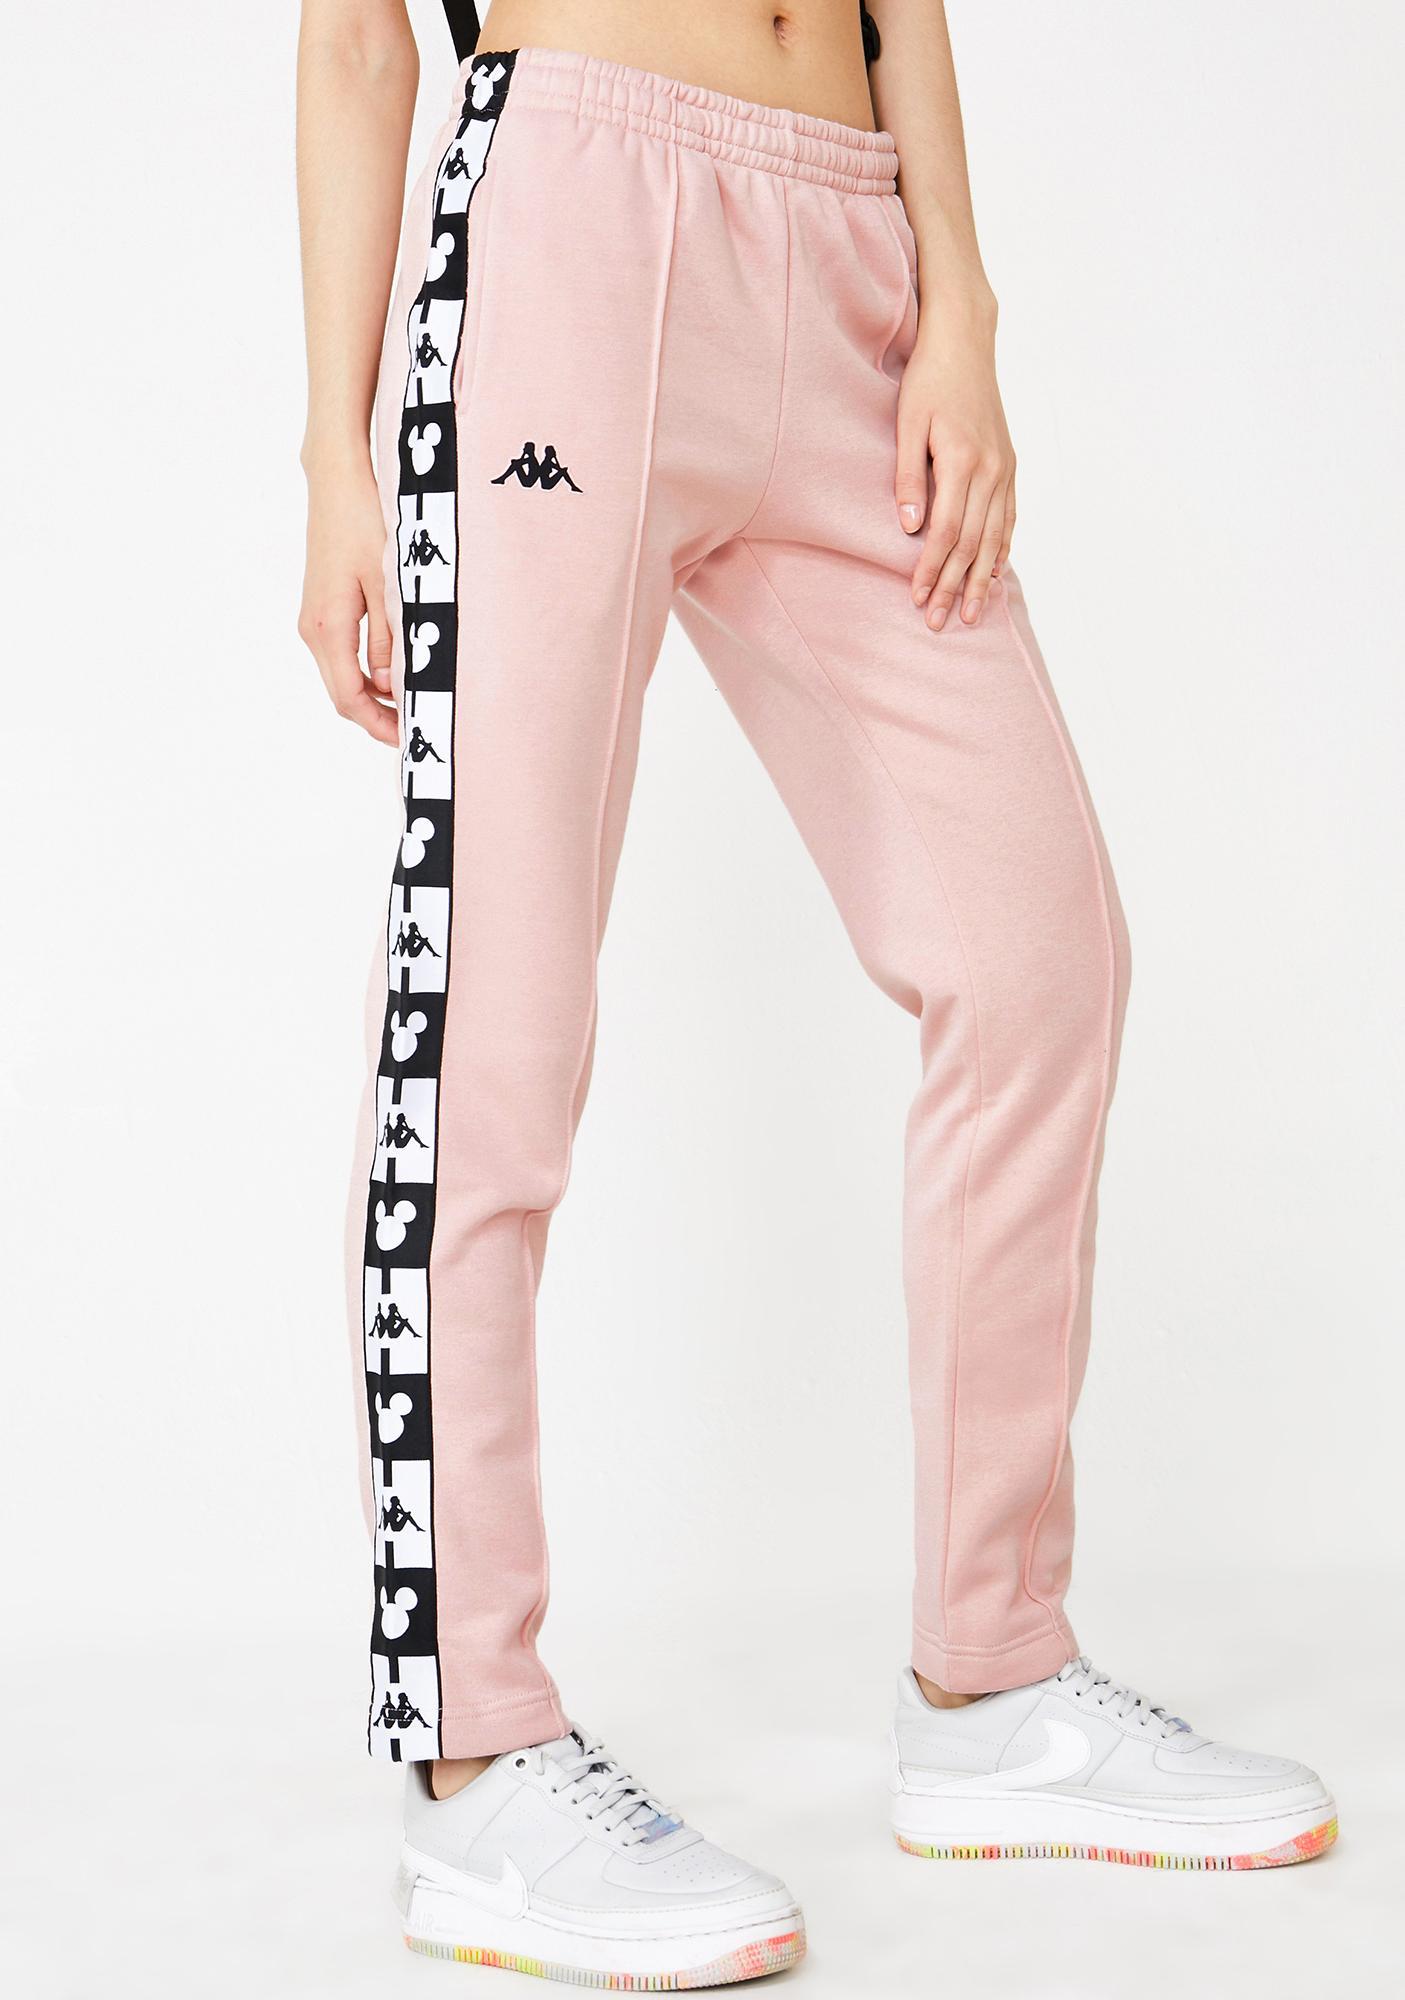 fec05a0b3c Authentic Alphonso Disney Sweatpants